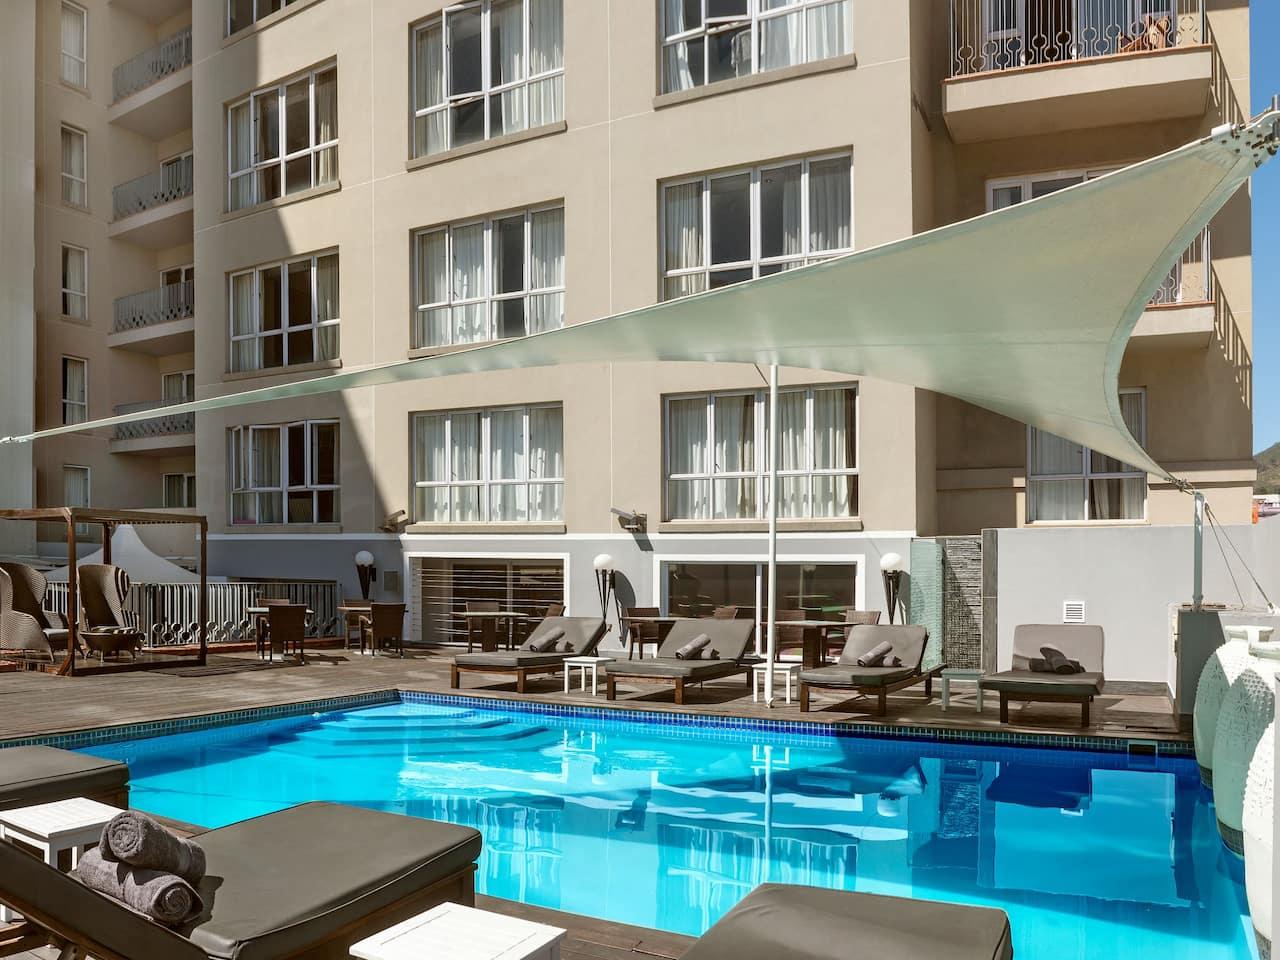 Hyatt Regency Cape Town pool